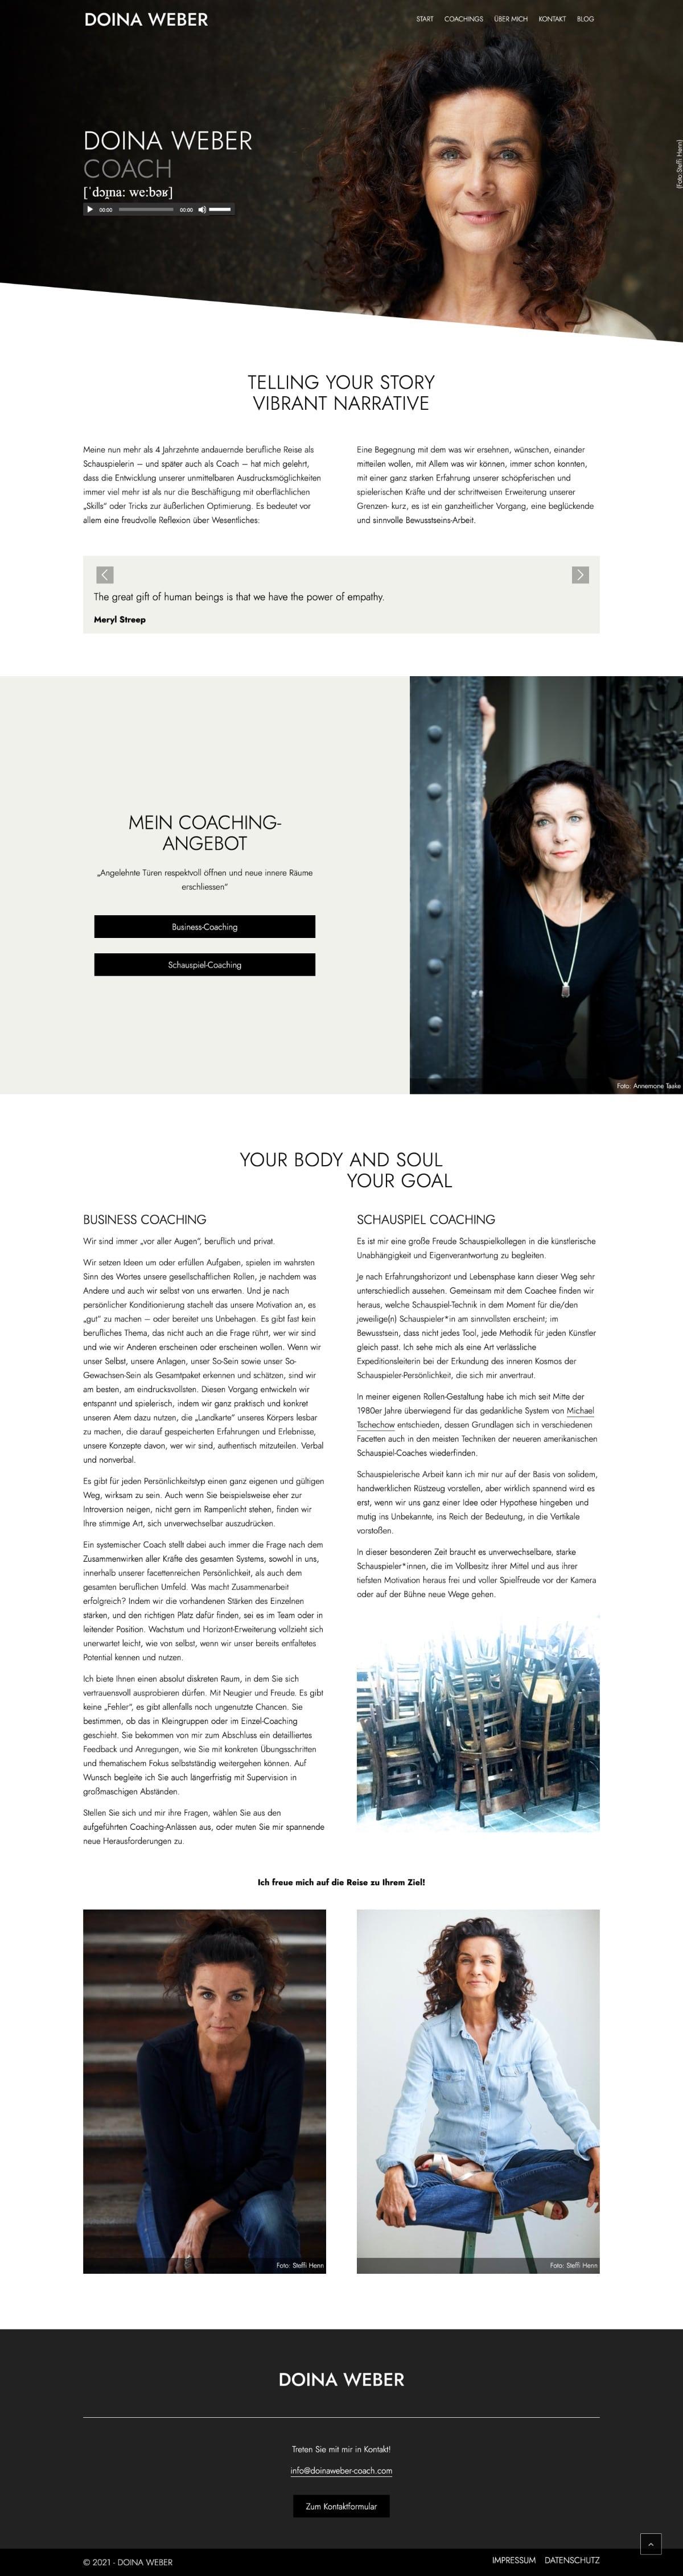 Doina Weber - Website